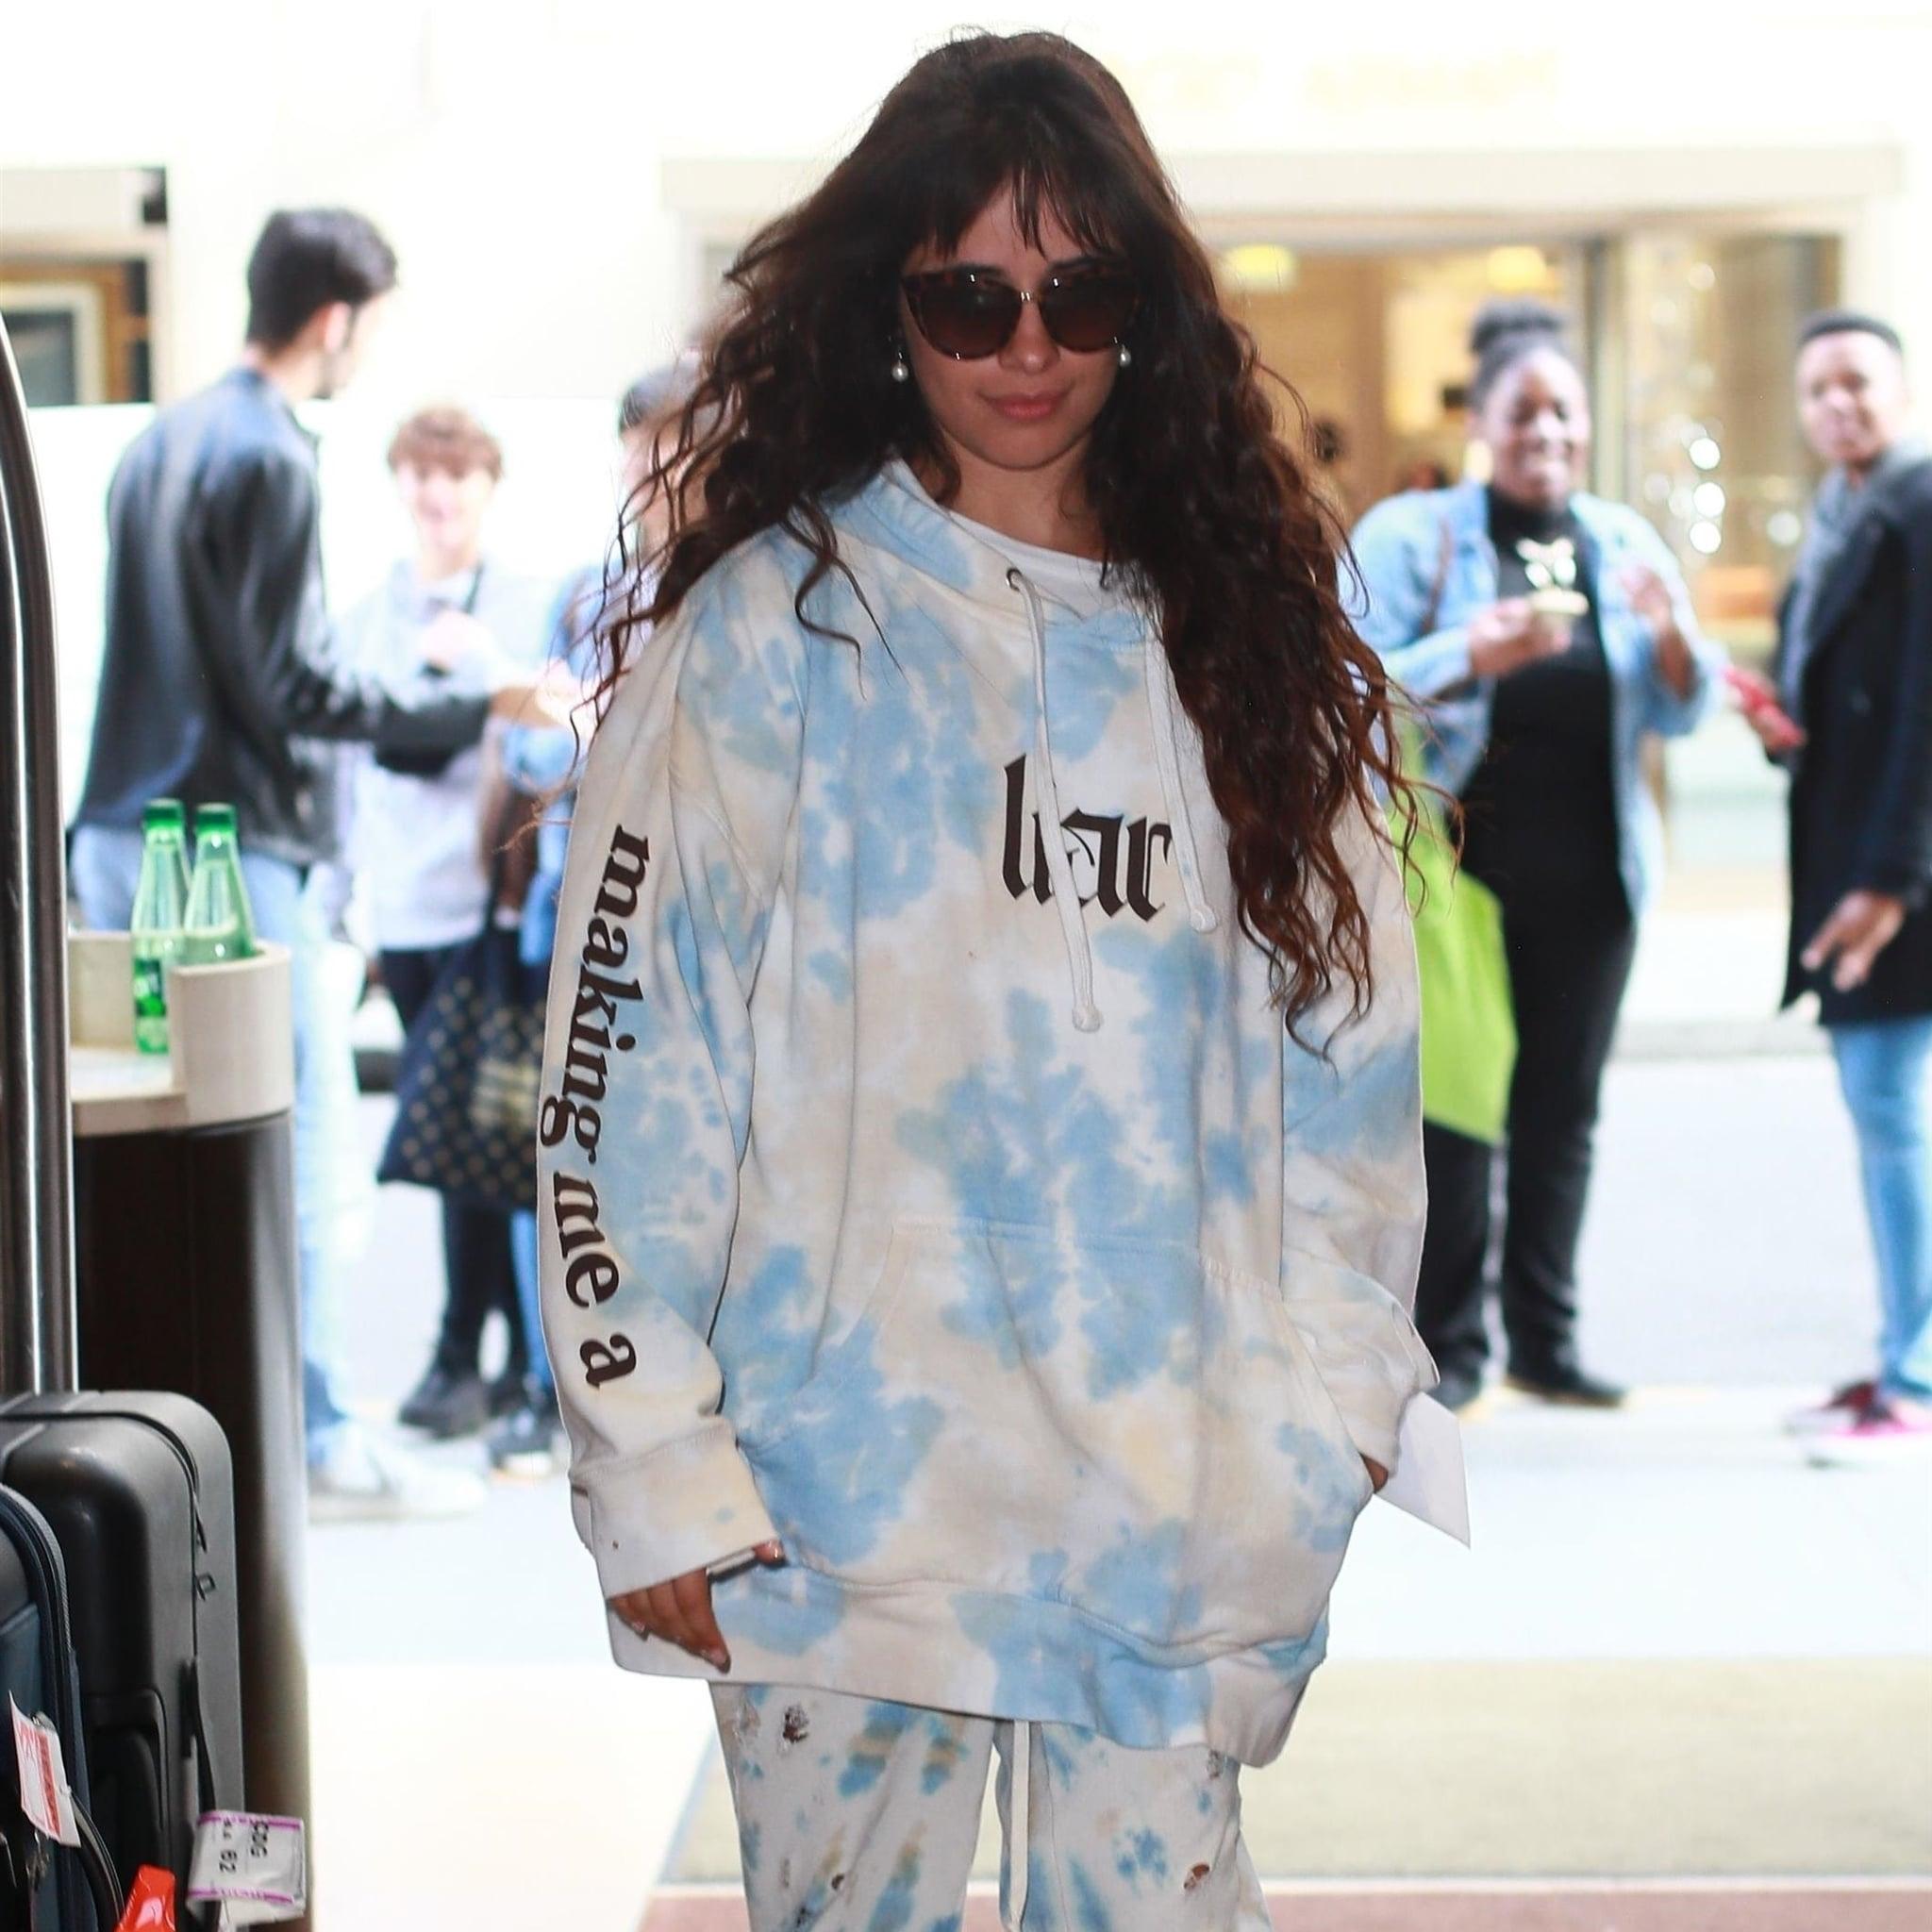 Camila Cabello Wears Her Liar Tie-Dye Sweatshirt in Paris | POPSUGAR Fashion